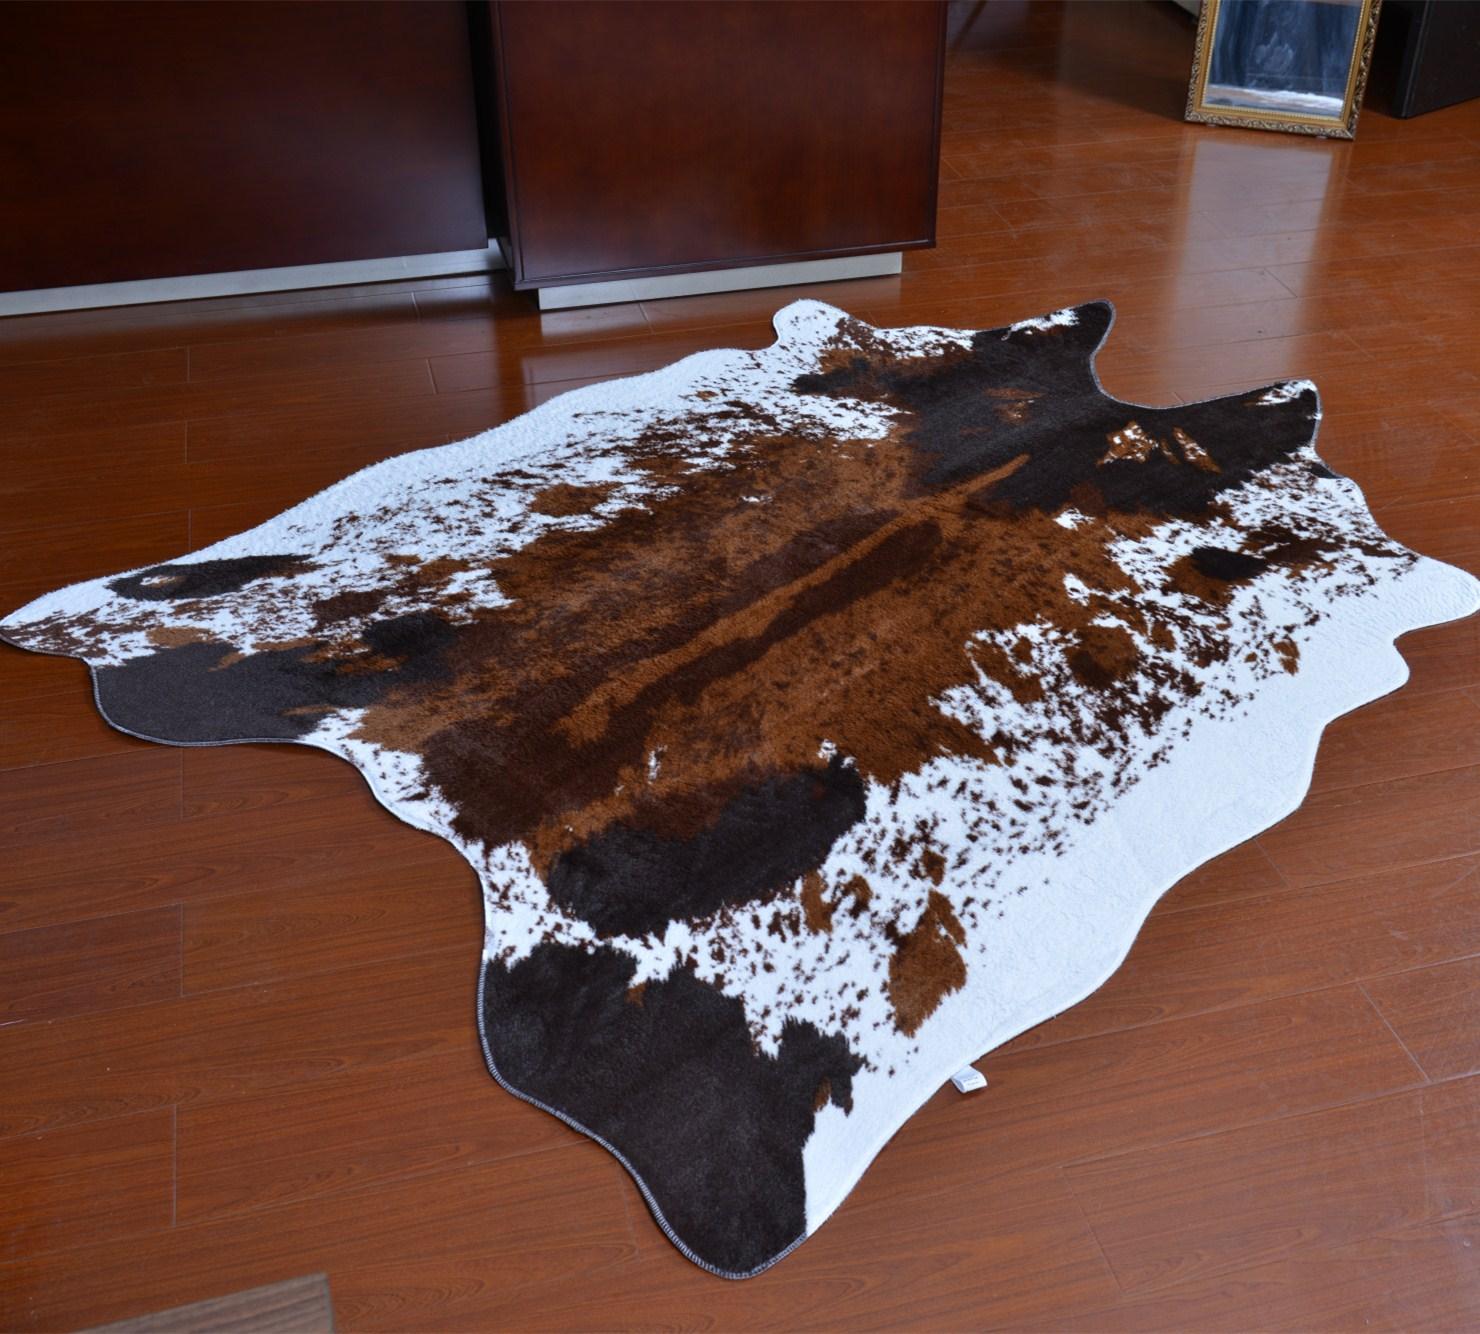 PV المخملية تقليد جلود السجاد و السجاد بقرة زيبرا السجاد 145*200 سنتيمتر السجاد لغرفة المعيشة غرفة نوم كبيرة الحجم حصيرة alfombra